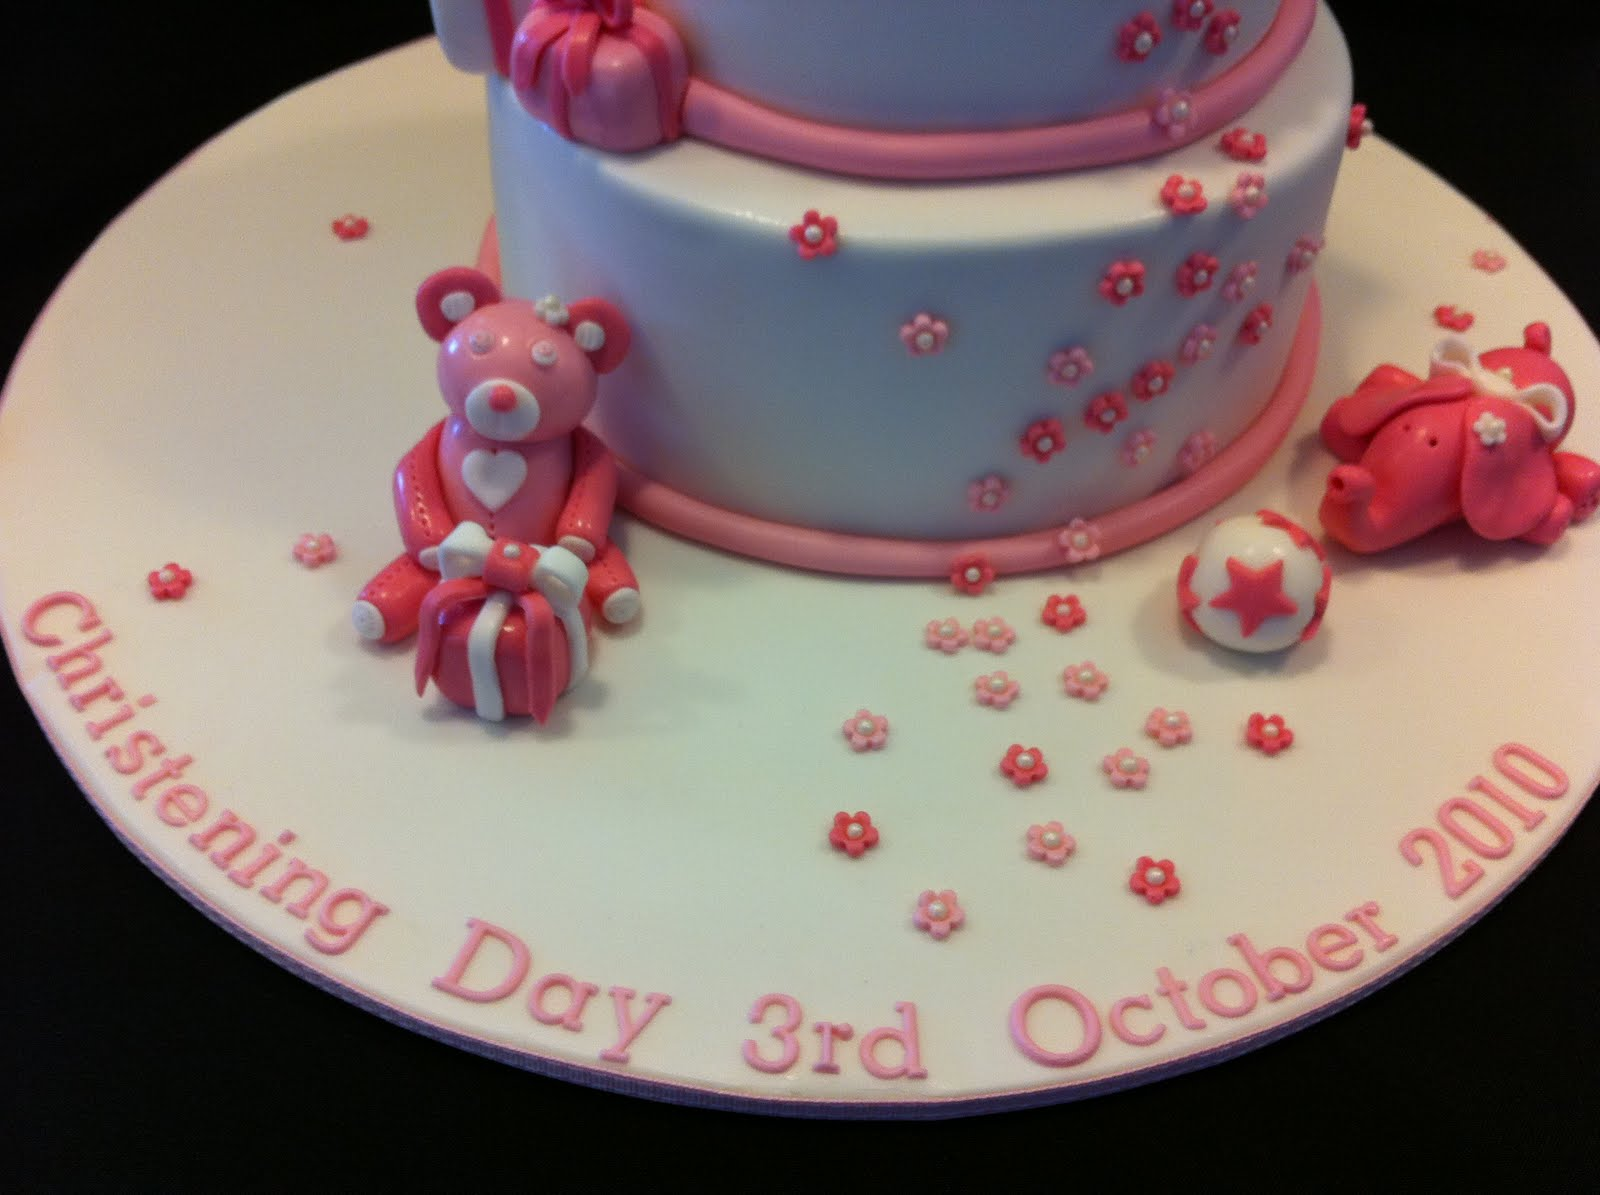 Cake Decorating Business Names Ideas